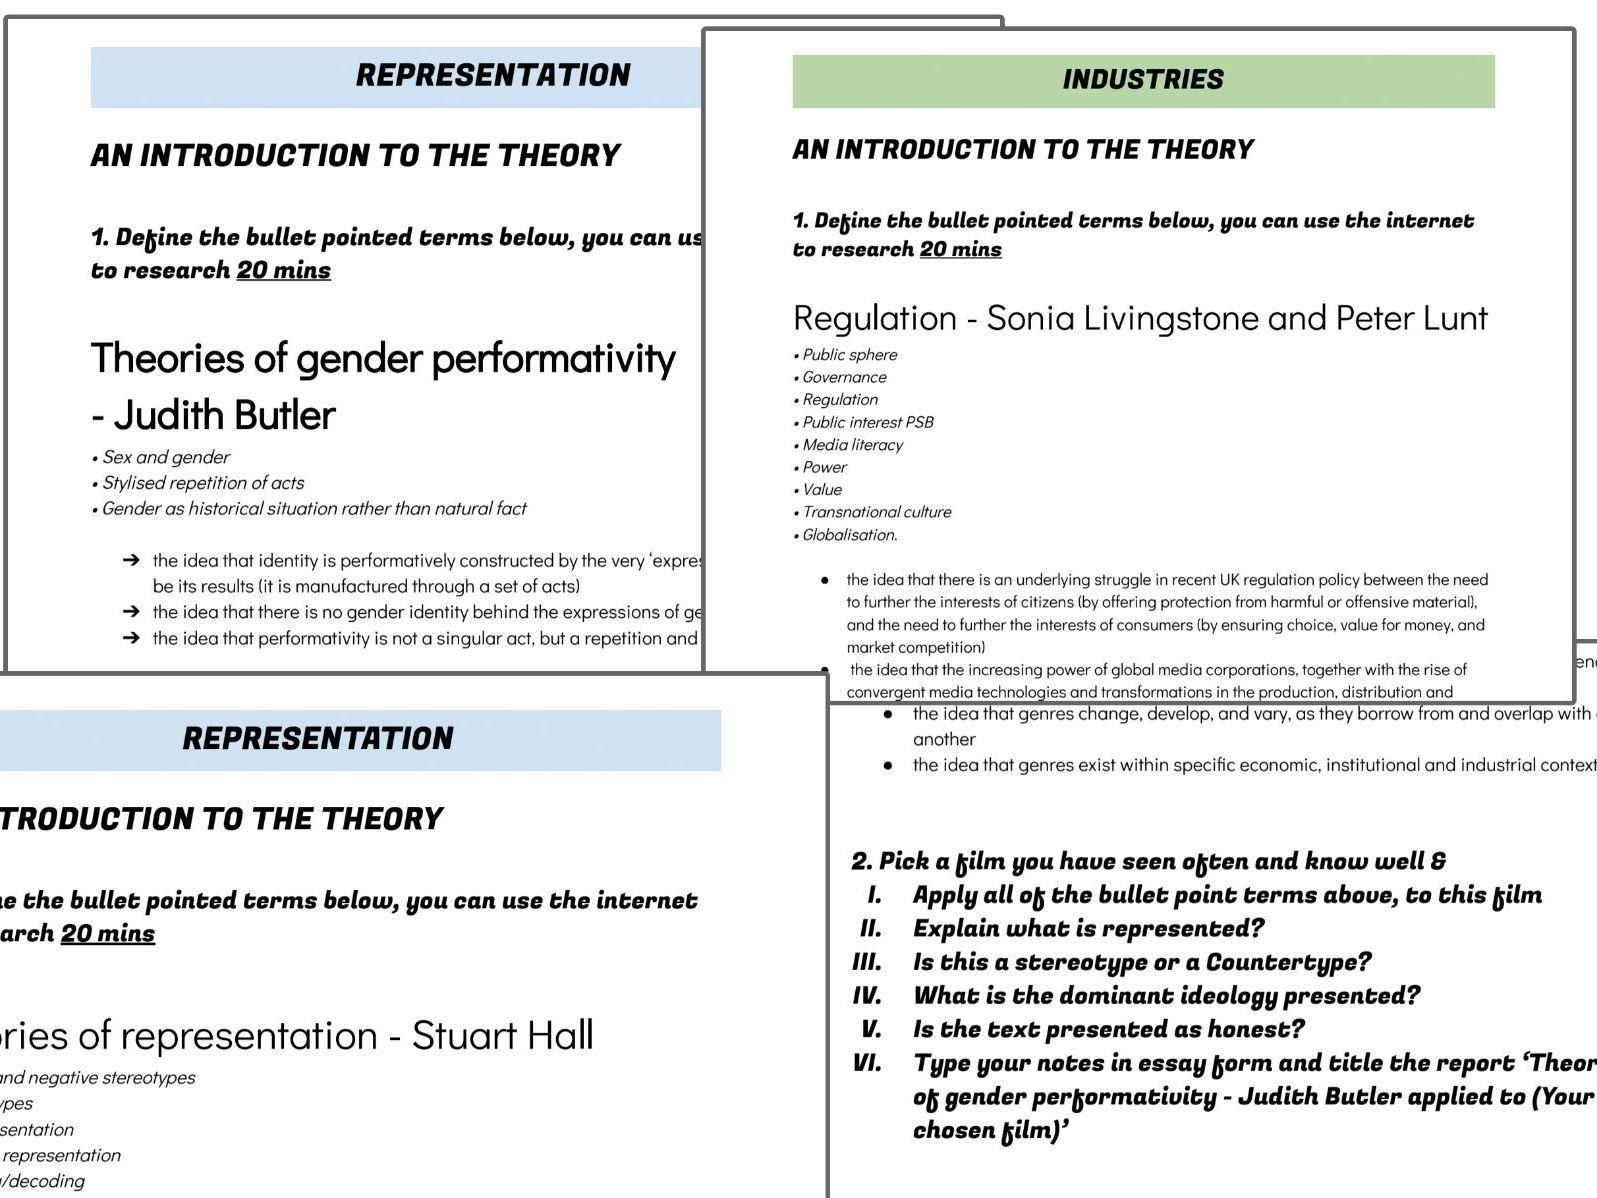 WJEC Media A Level Representation & Industry worksheets Hall, Butler, Curran & Livingstone